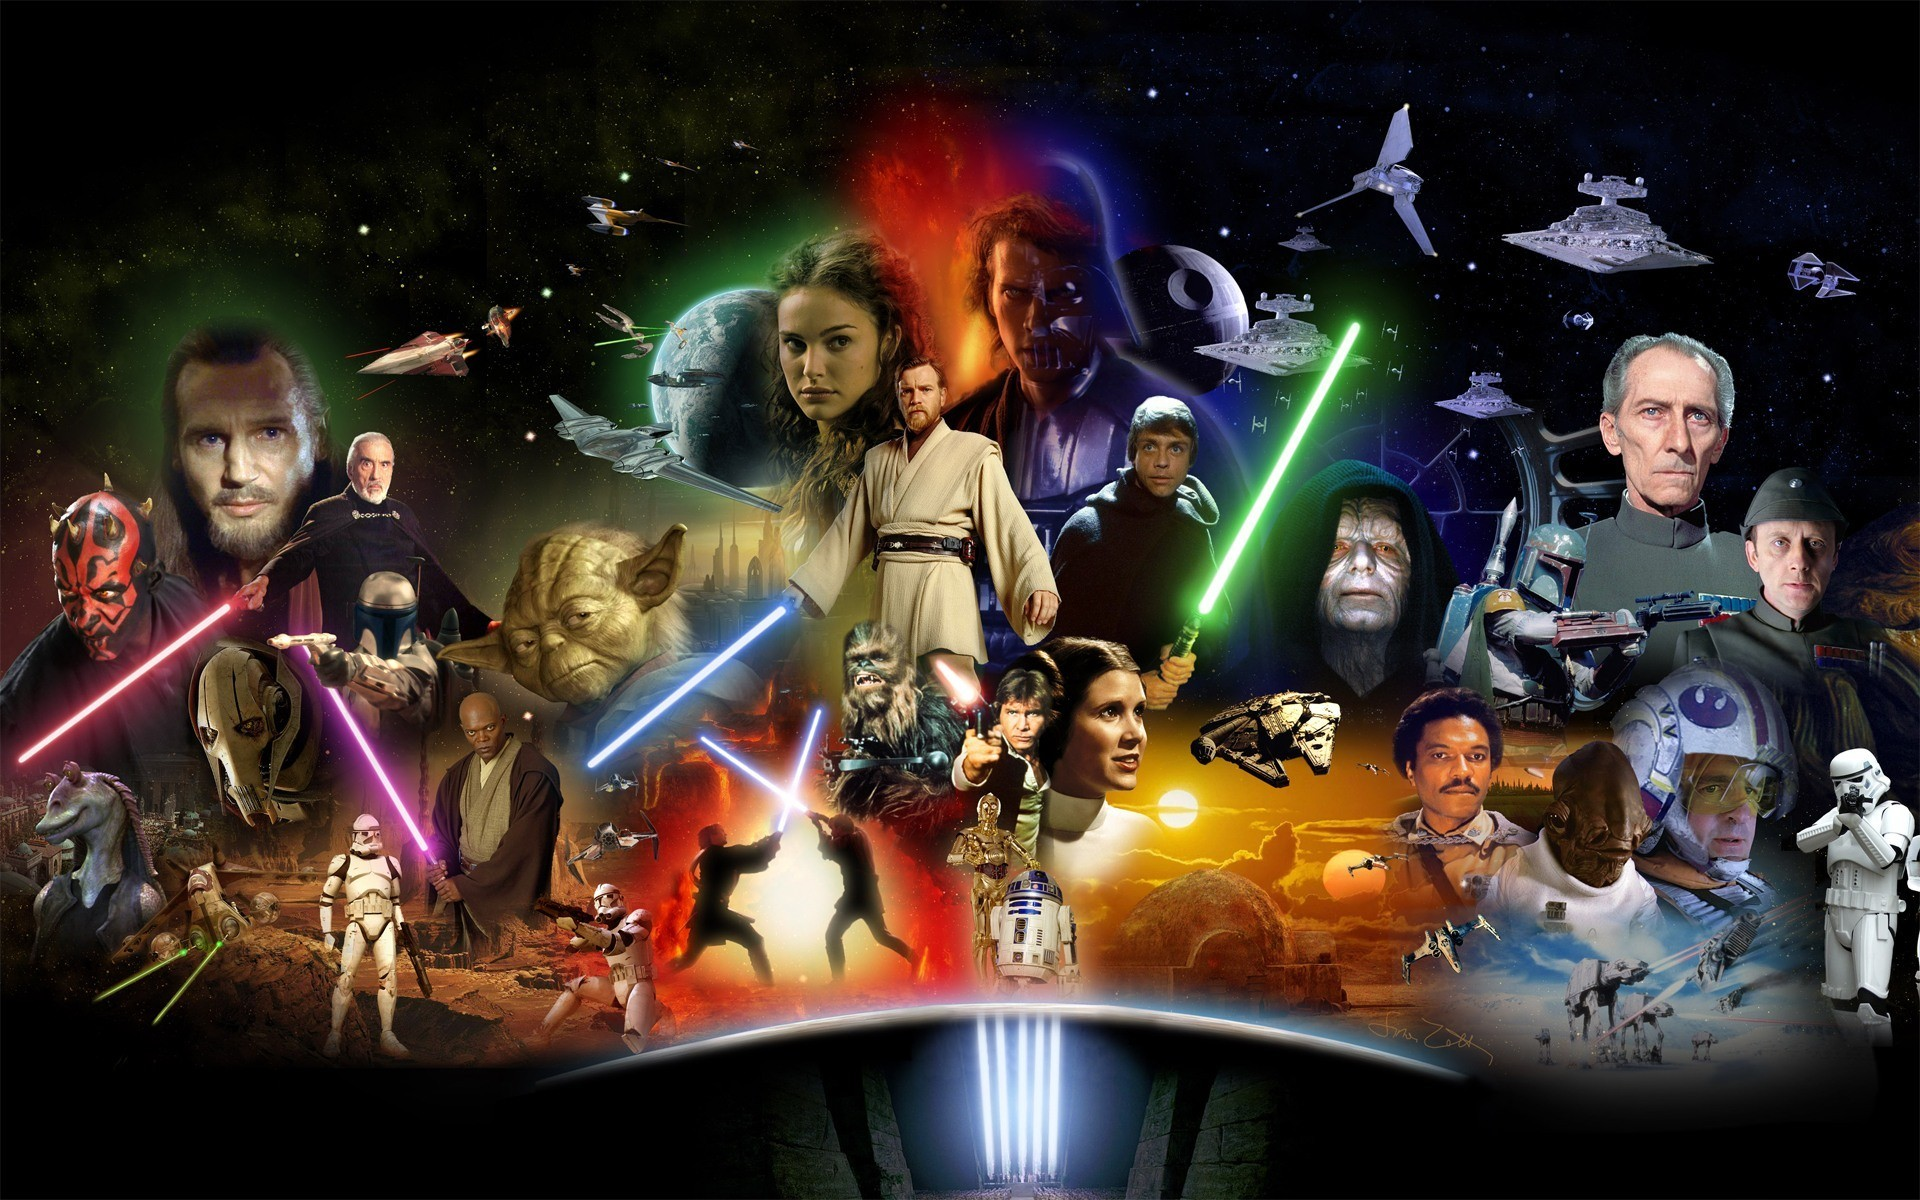 Star Wars / Звездные войны.